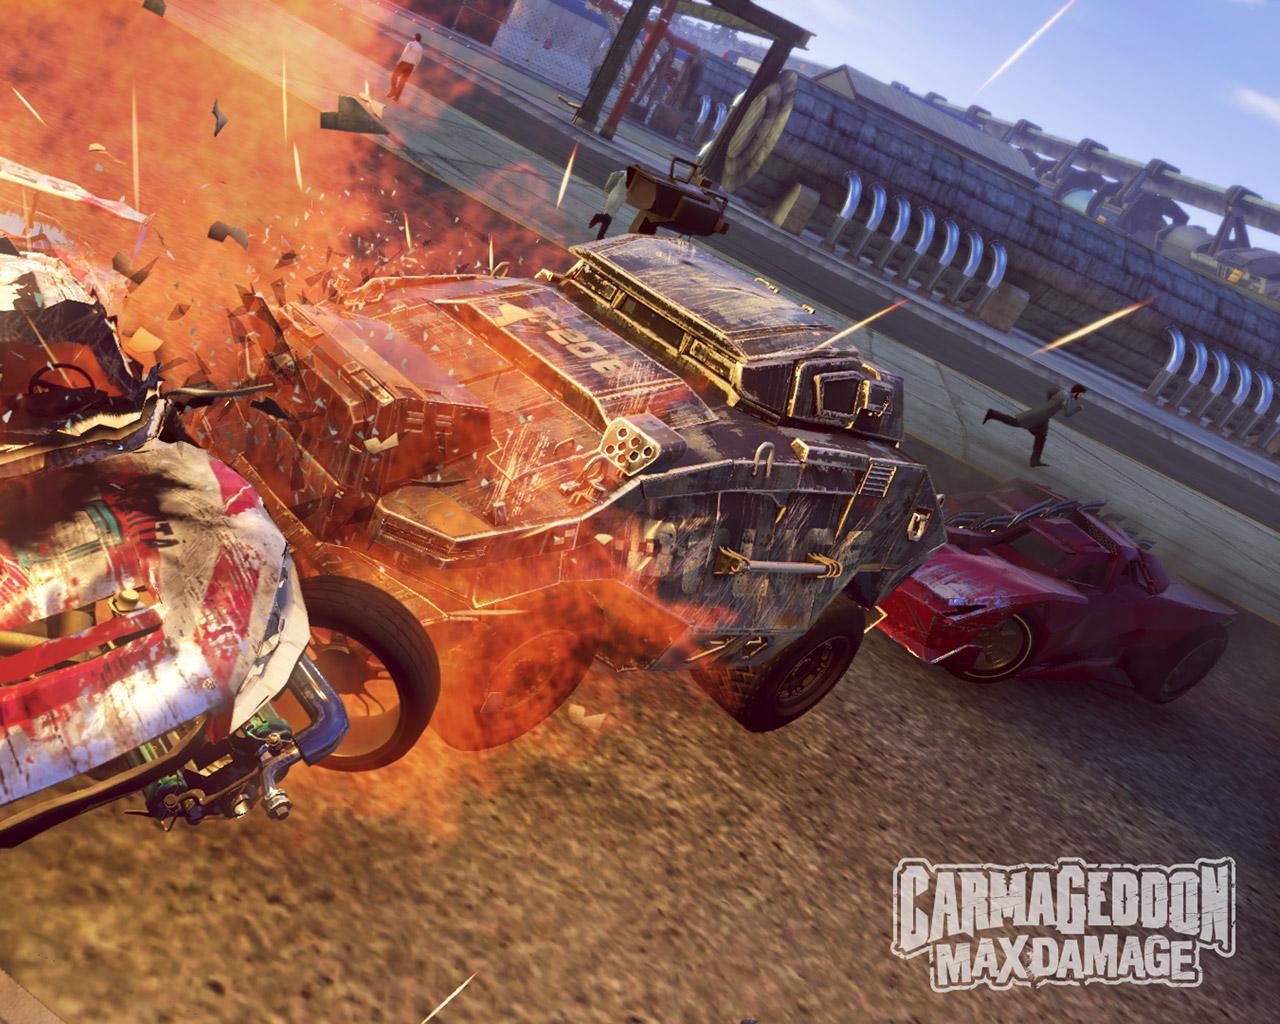 Free Carmageddon: Max Damage Wallpaper in 1280x1024